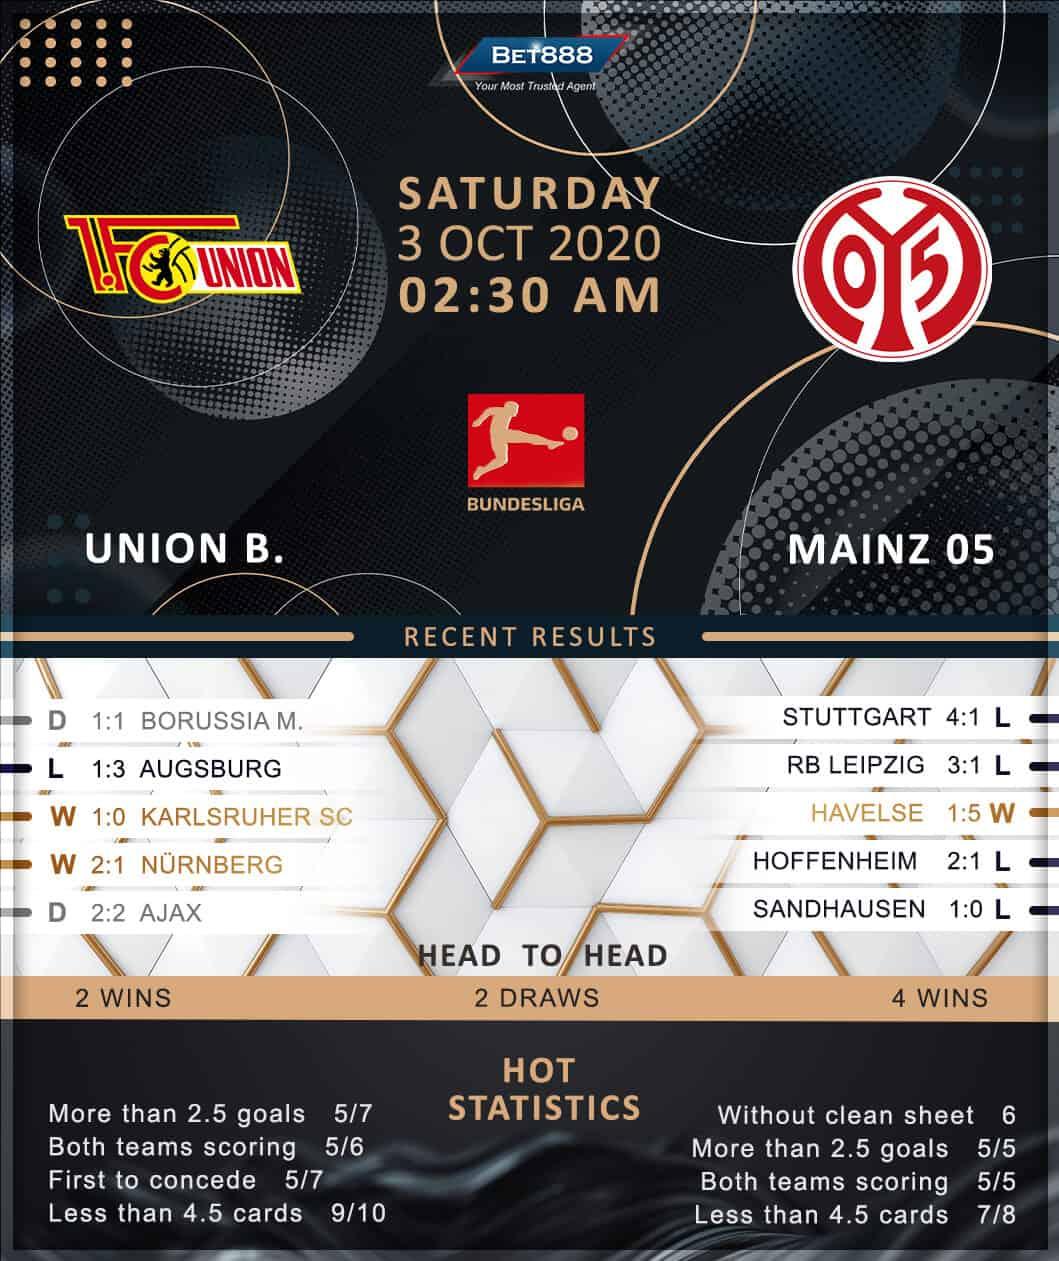 Union Berlin vs Mainz 05 03/10/20